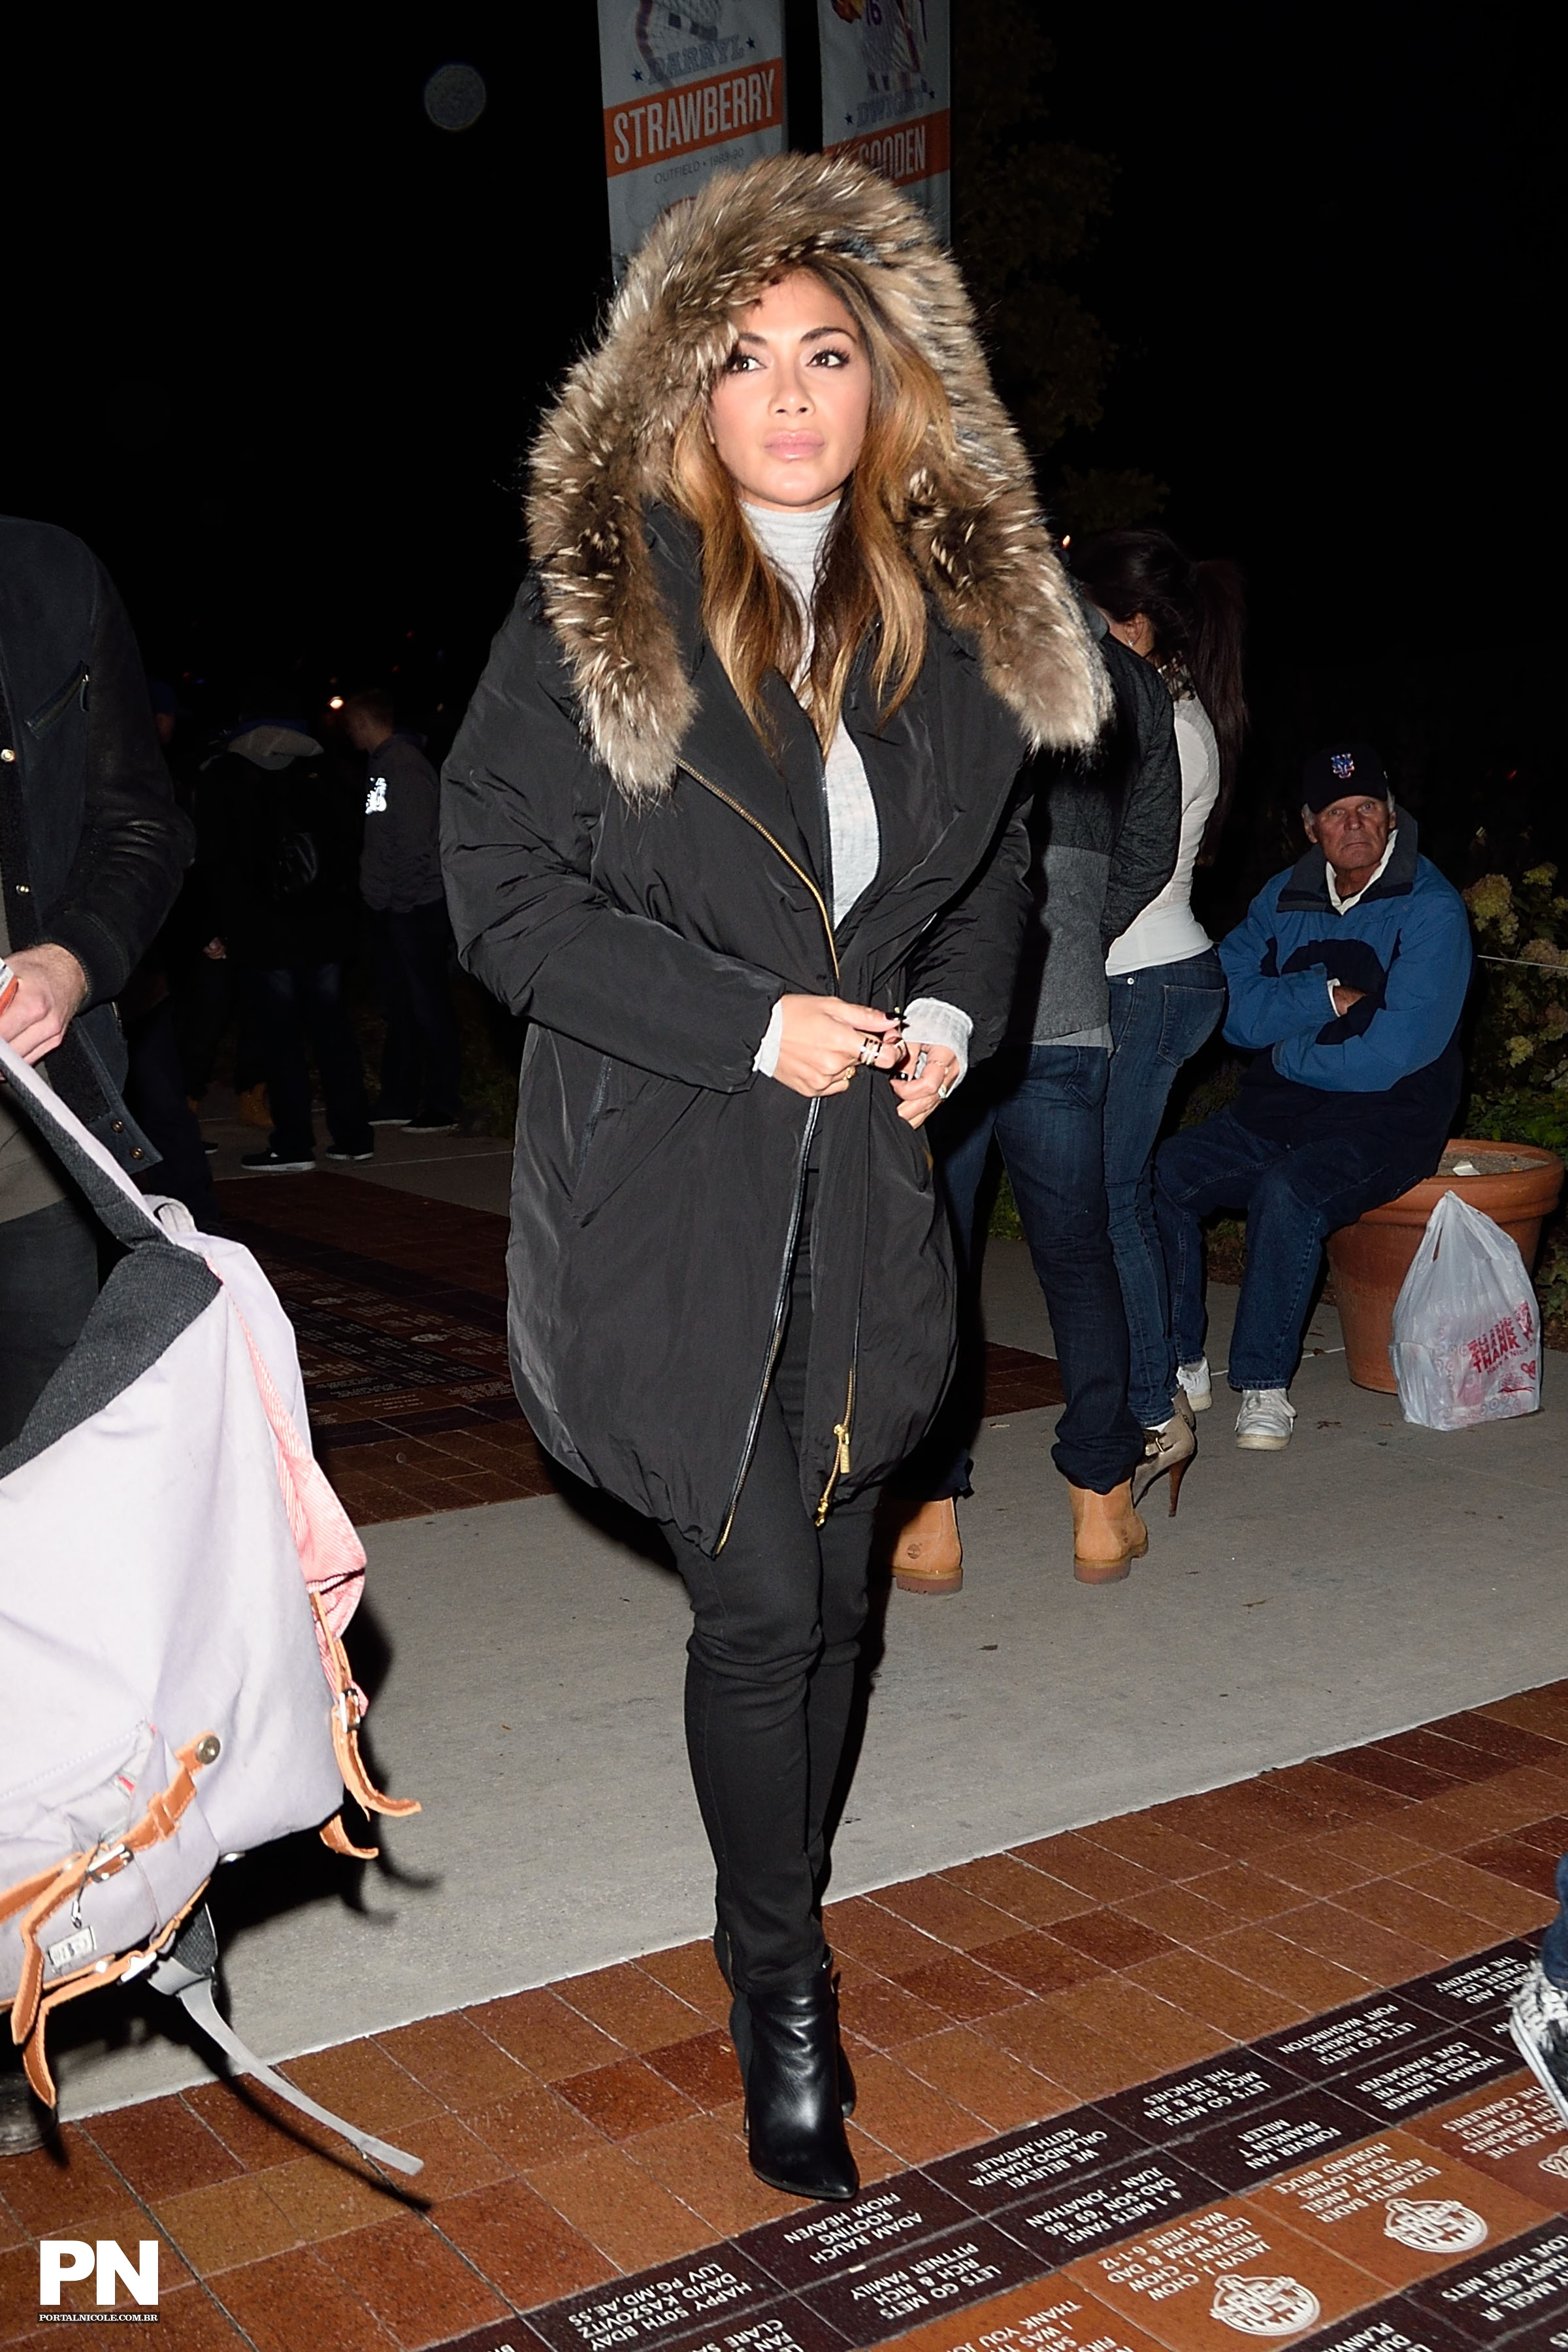 Nicole Scherzinger >> Candids/Apariciones/Shoots - Página 11 003